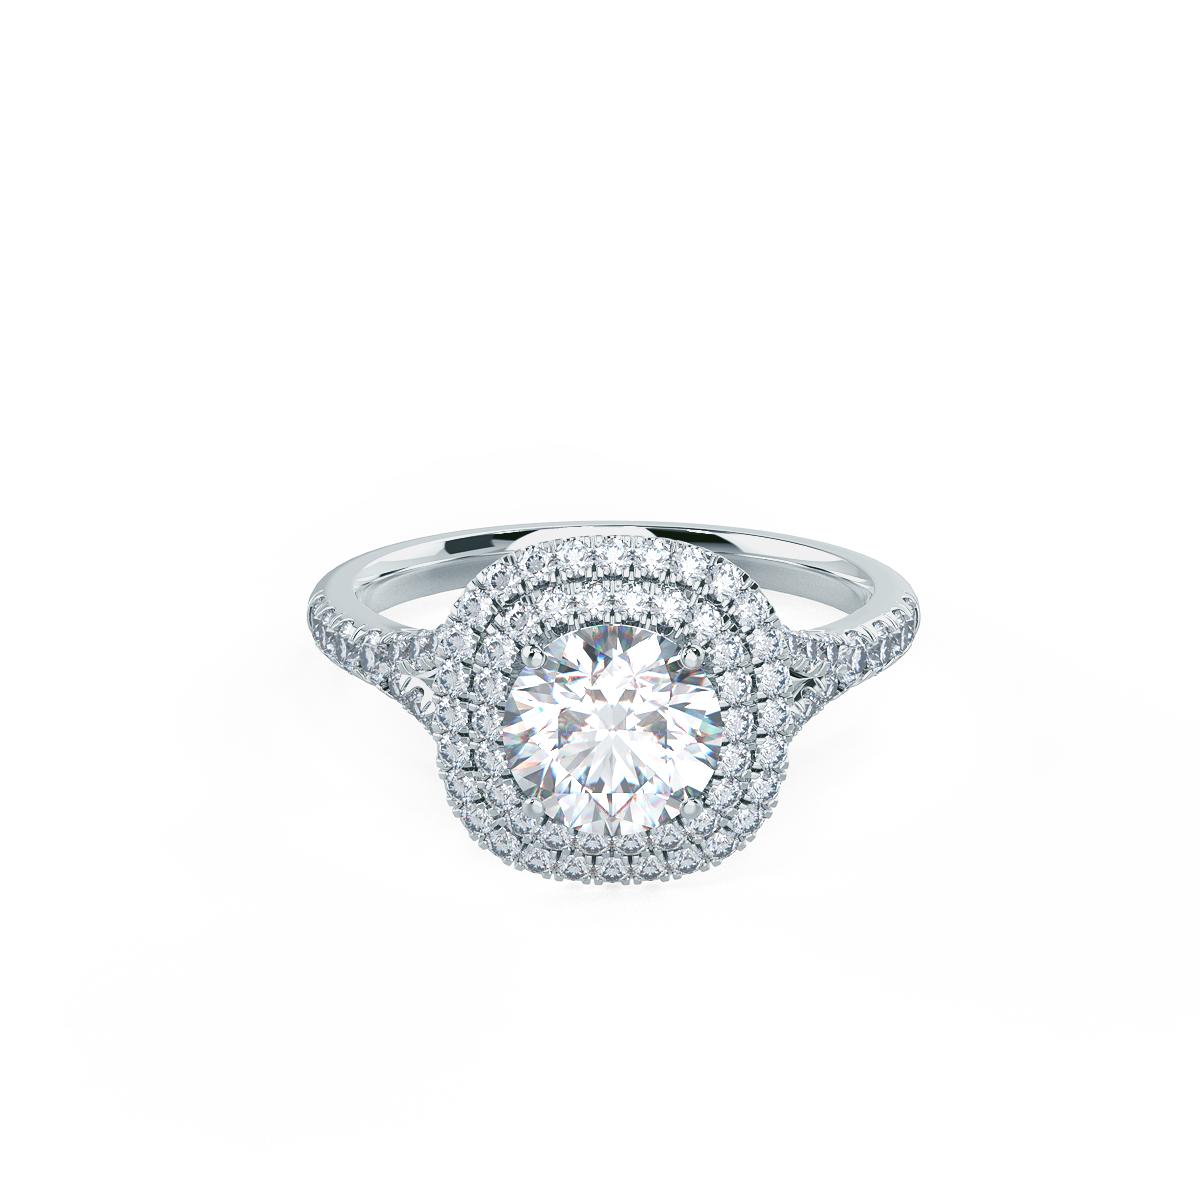 Halo Setting Lab Created Diamond Engagement Rings